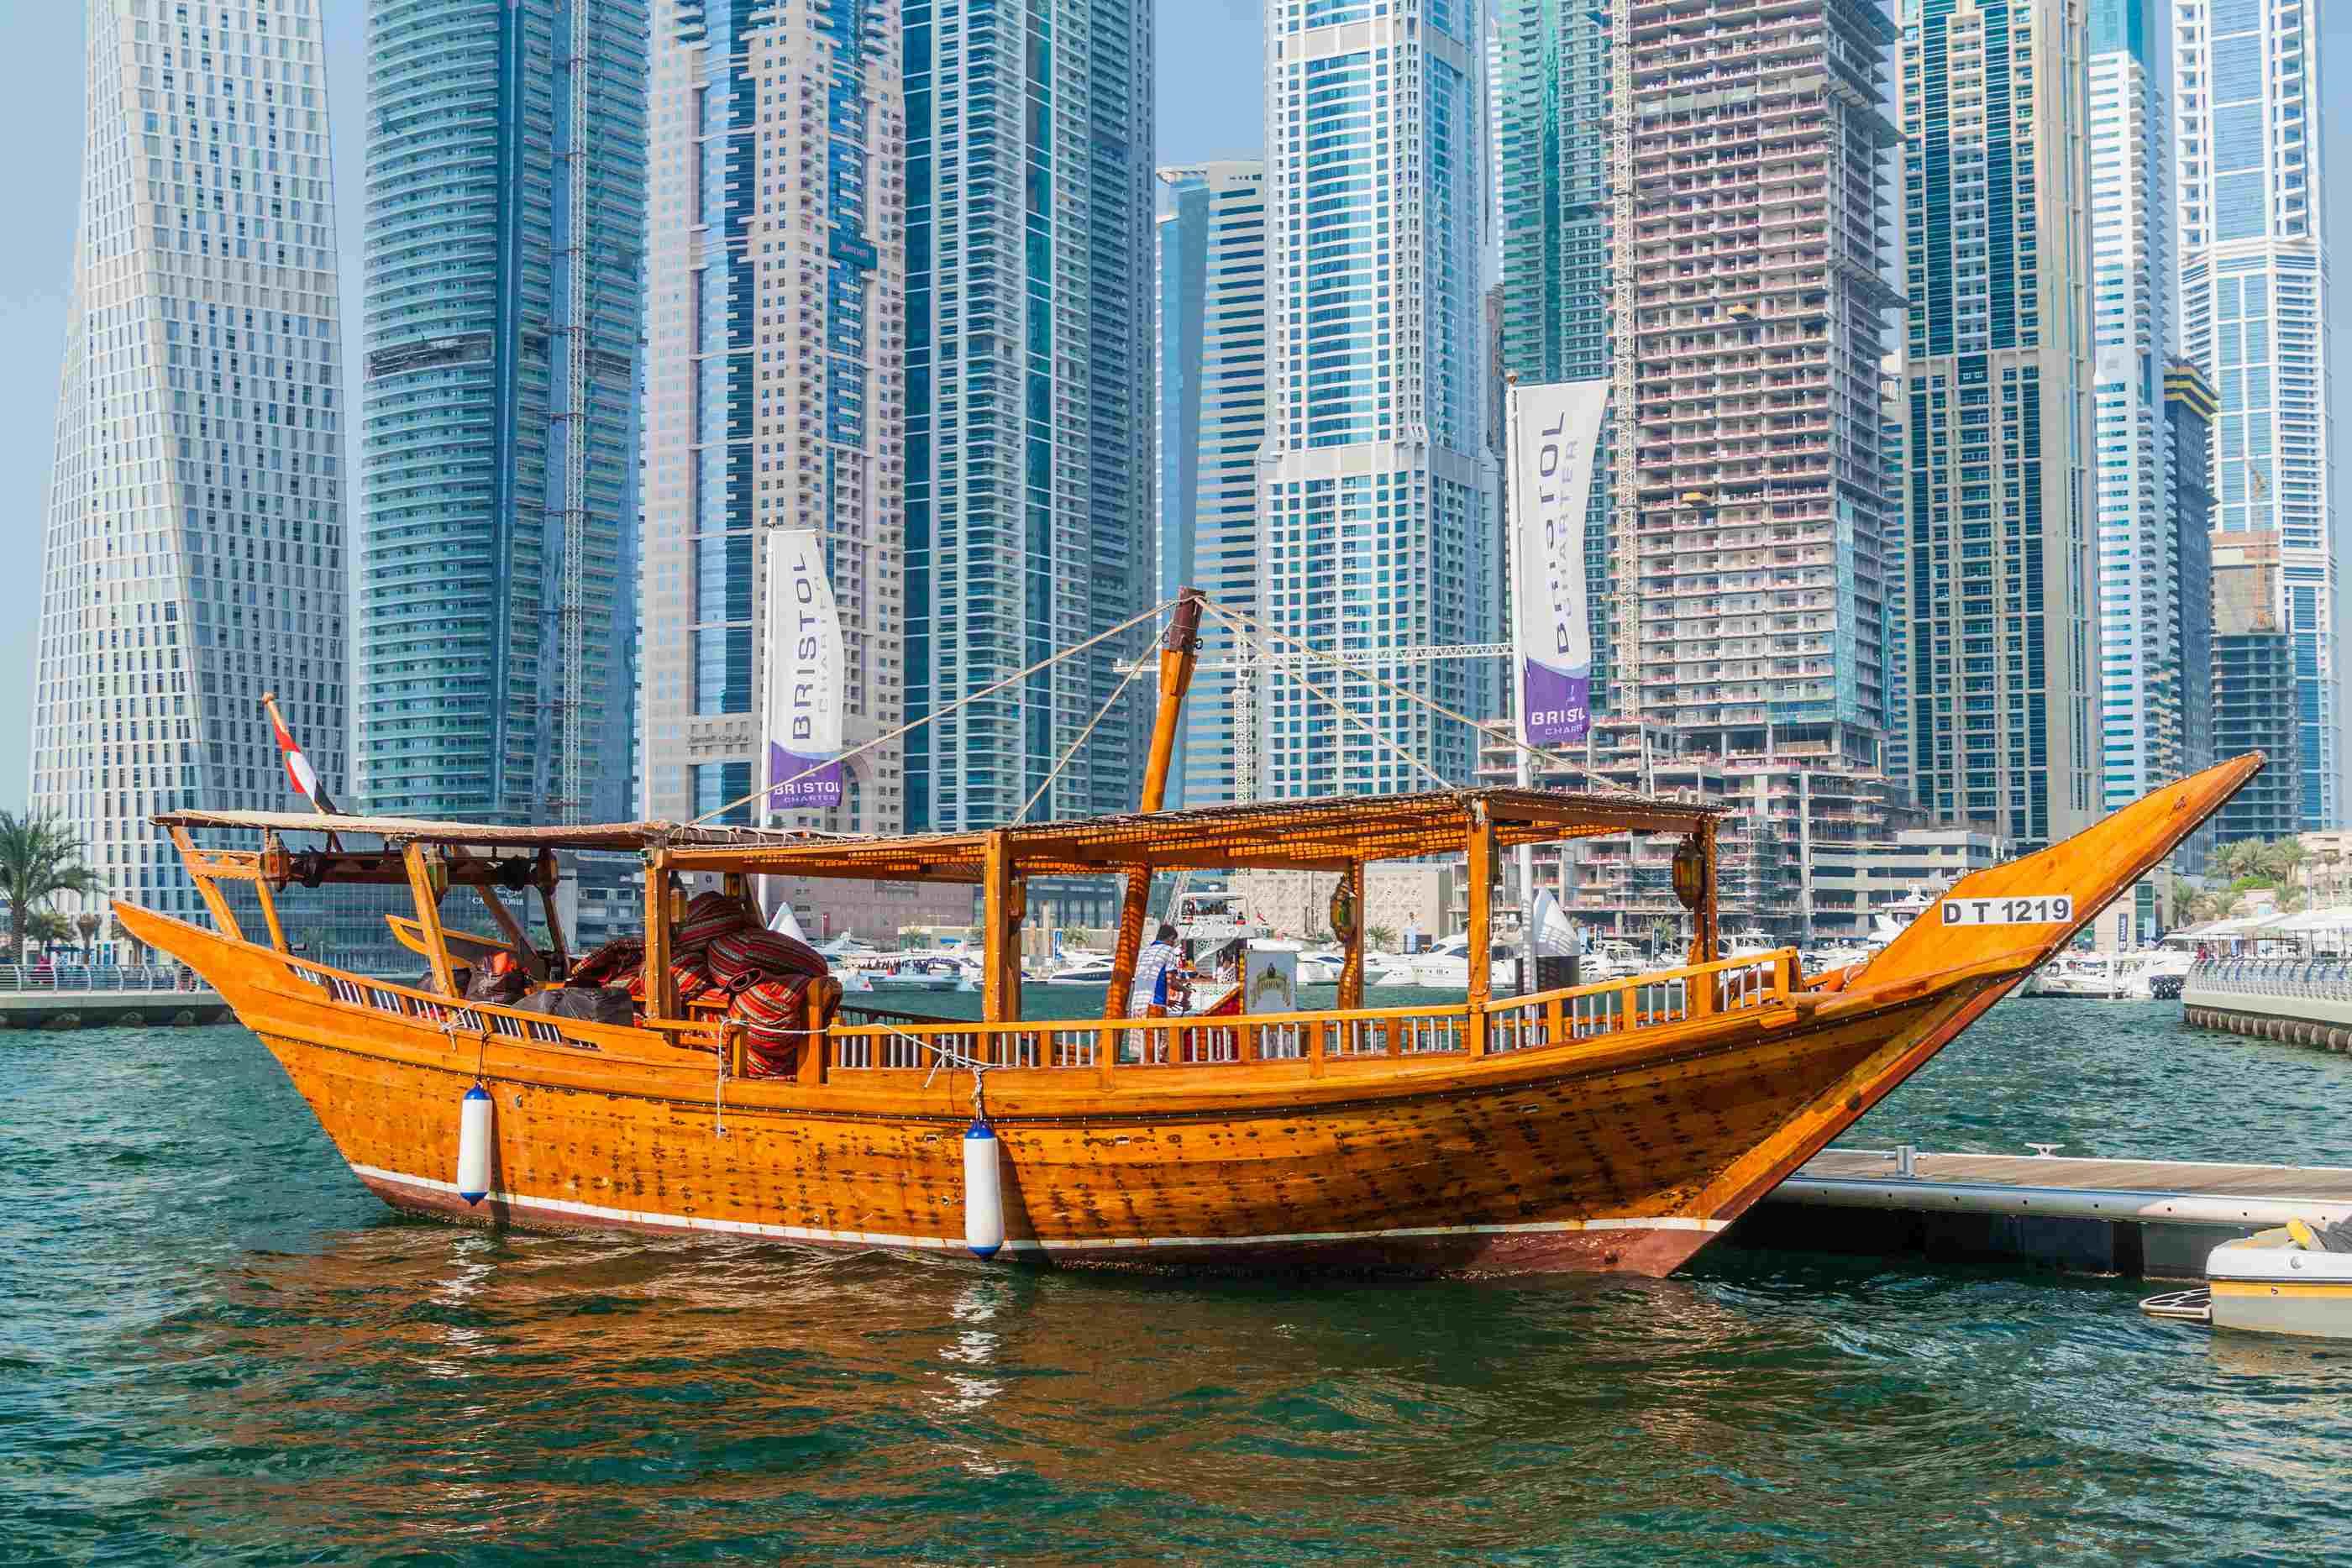 Dubai Wooden boat